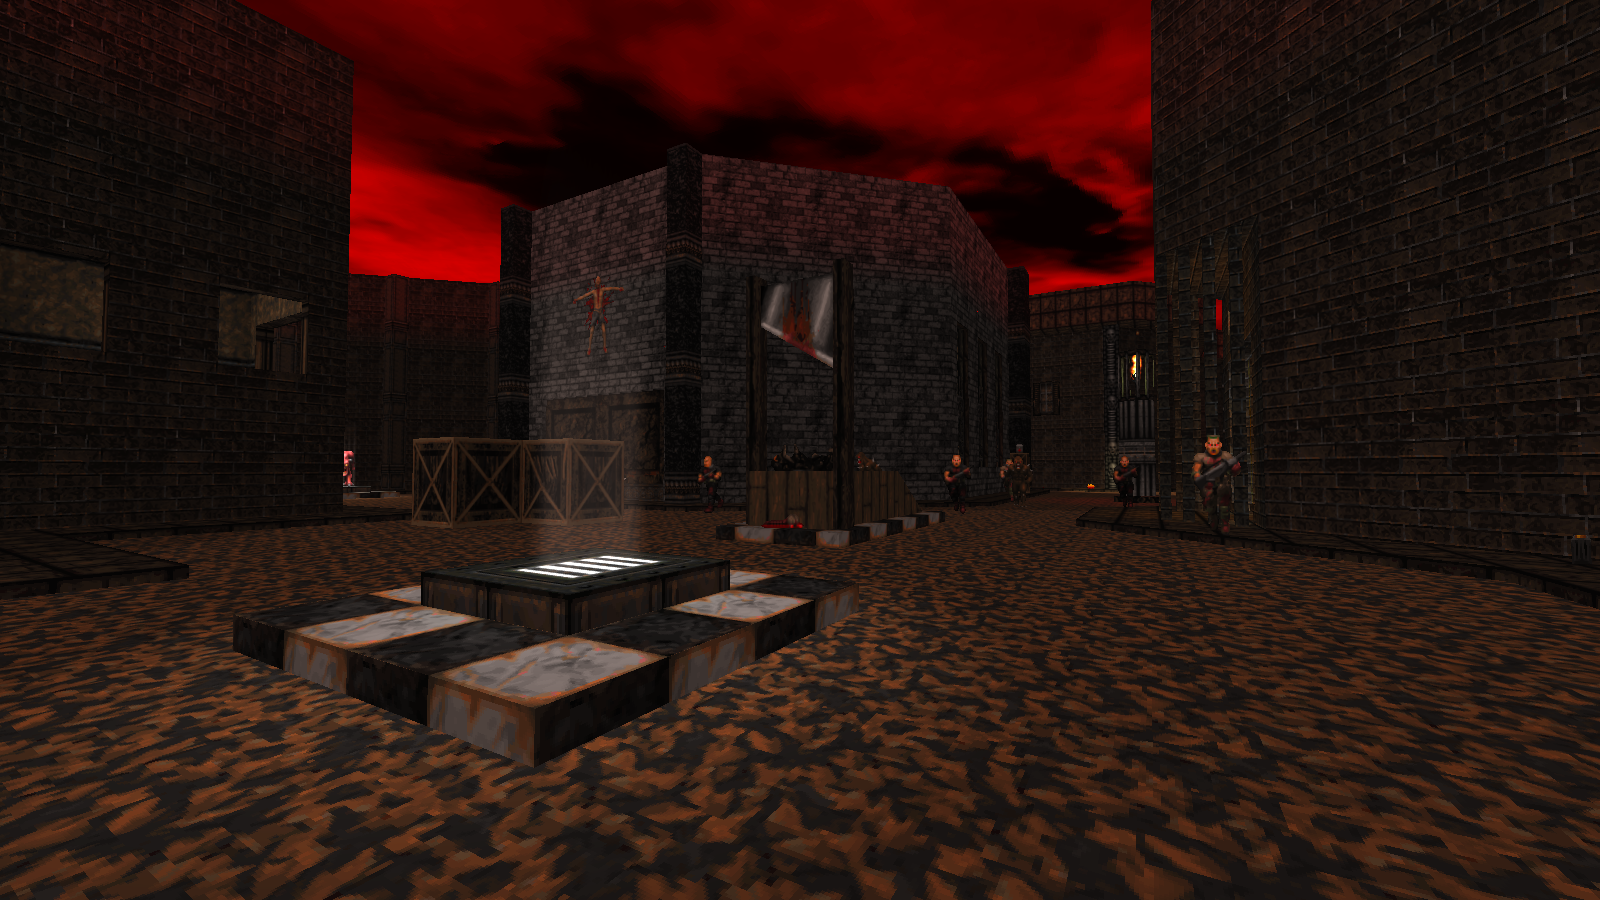 Screenshot_Doom_20200426_100221.png.f27e0beb3202844b6a181f05fb6803f9.png